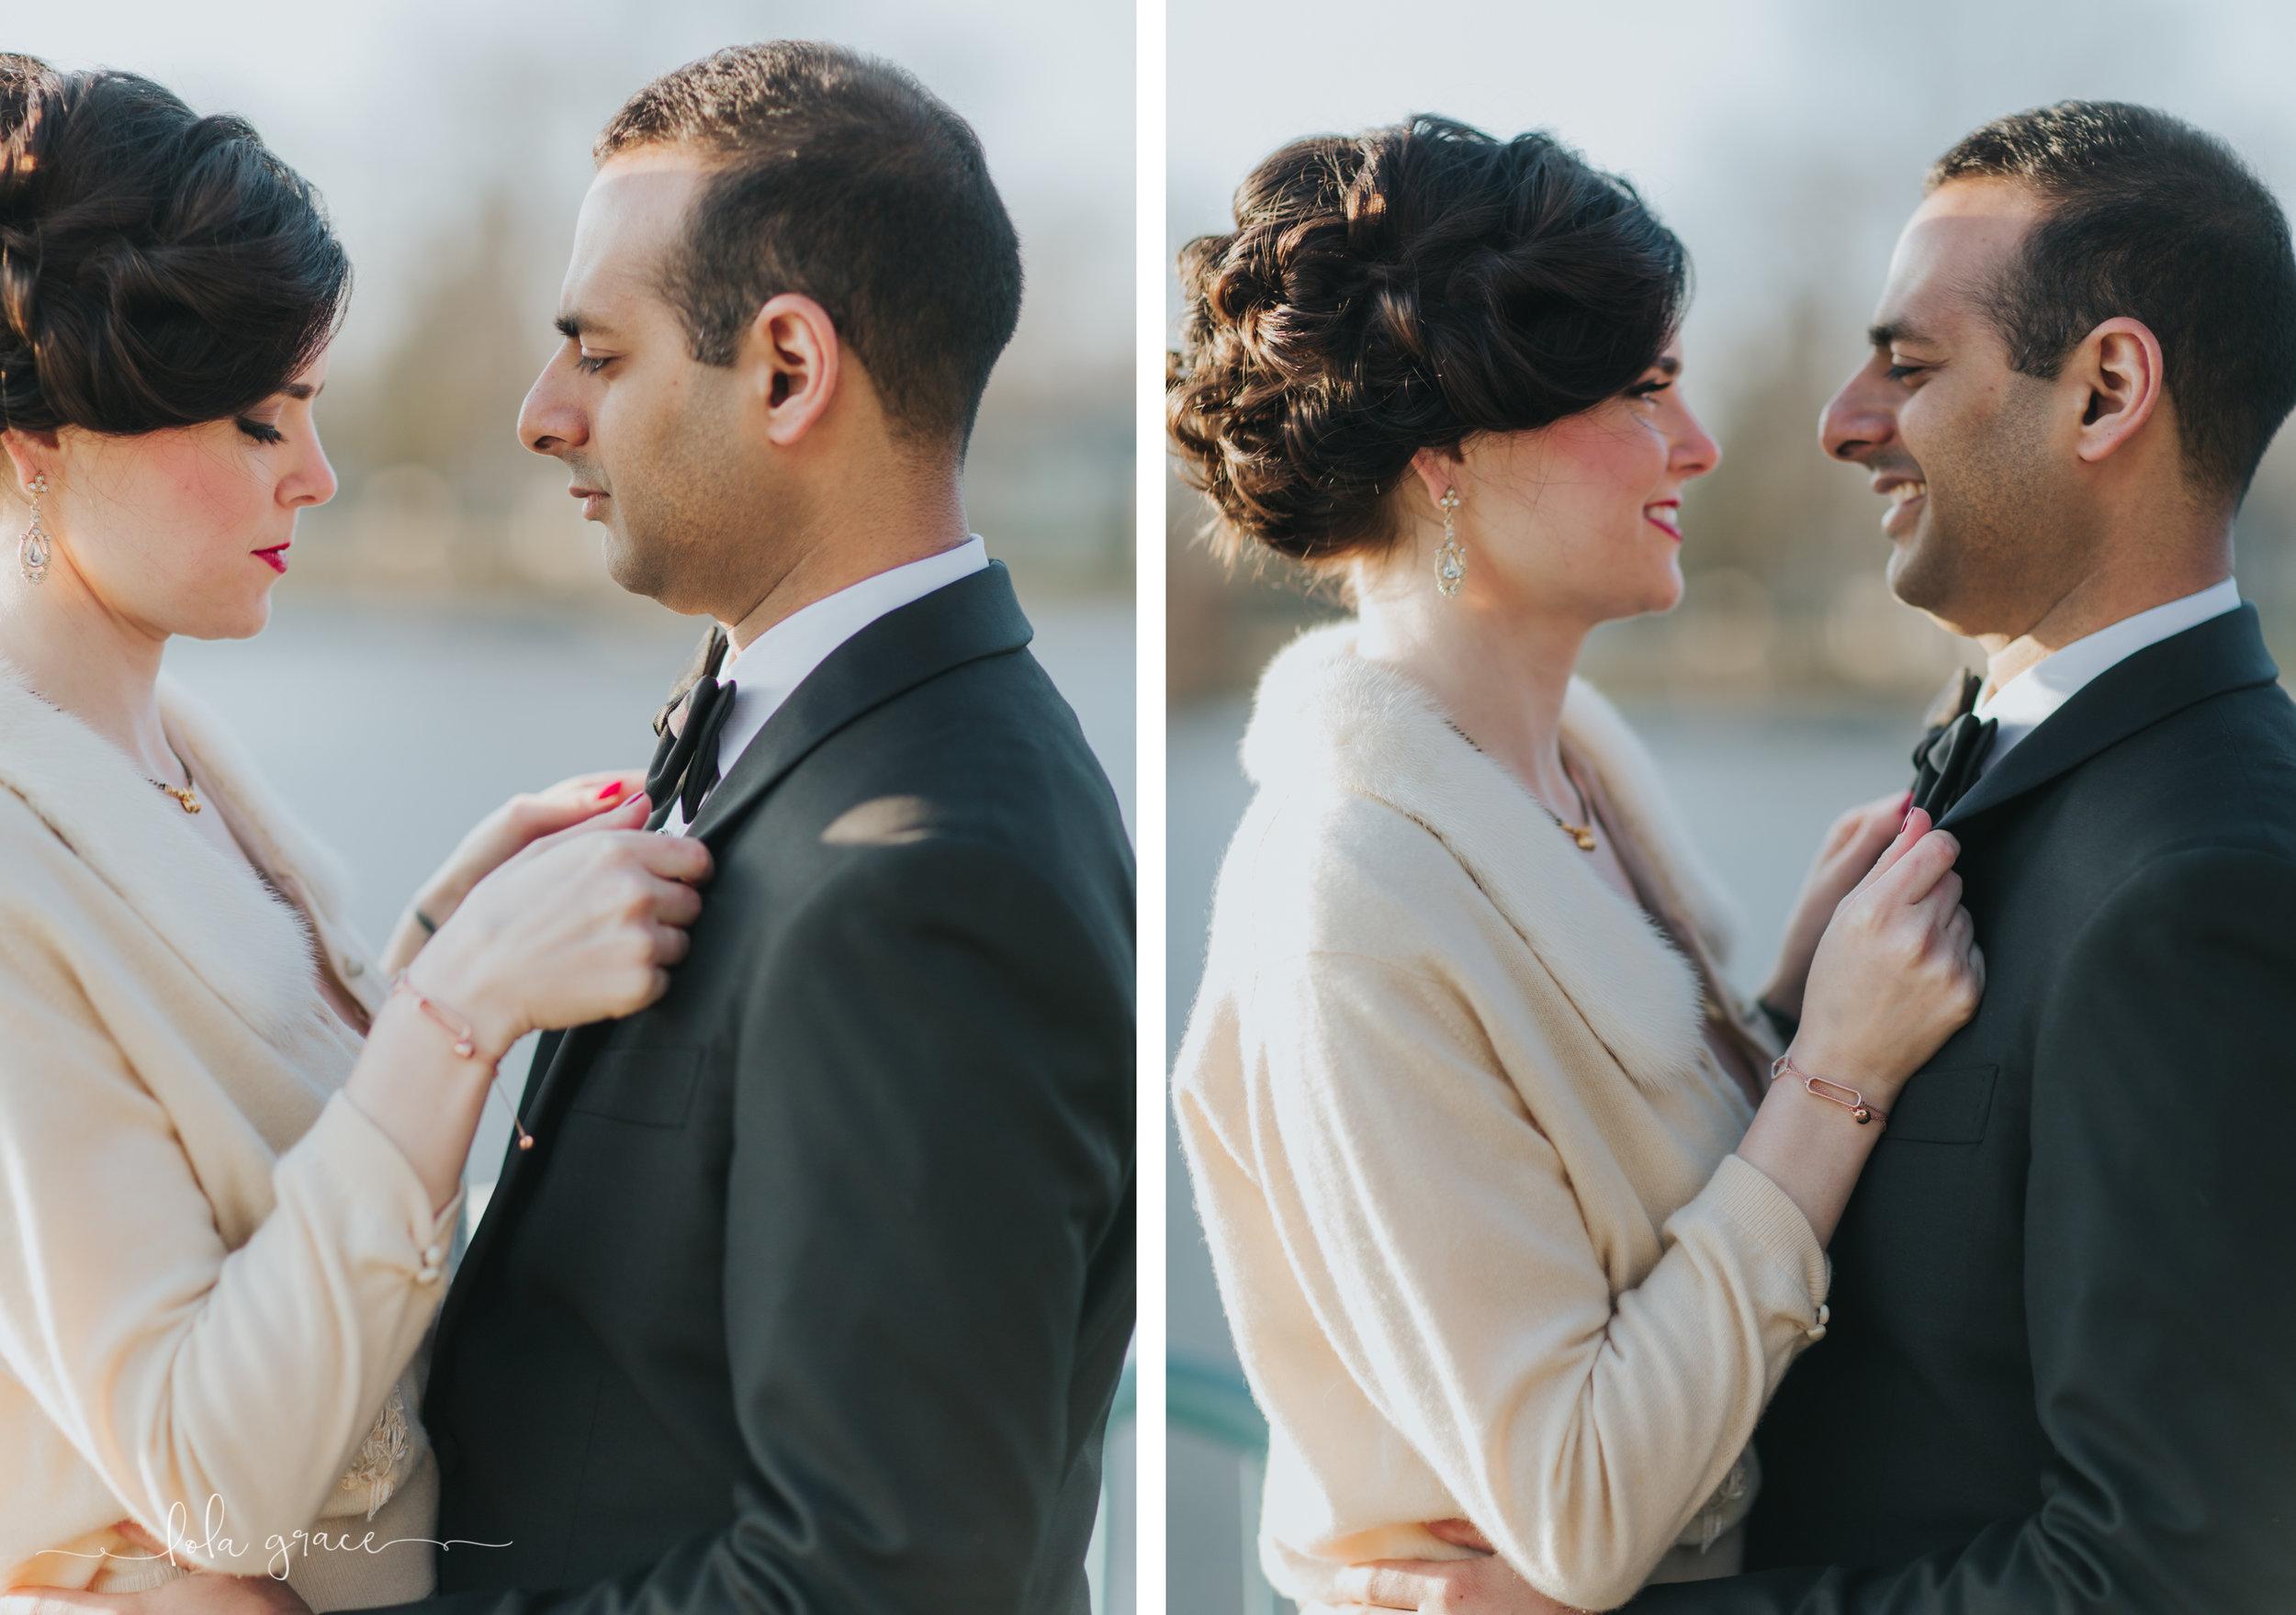 lola-grace-photography-erin-nik-brighton-mi-wedding-17.jpg